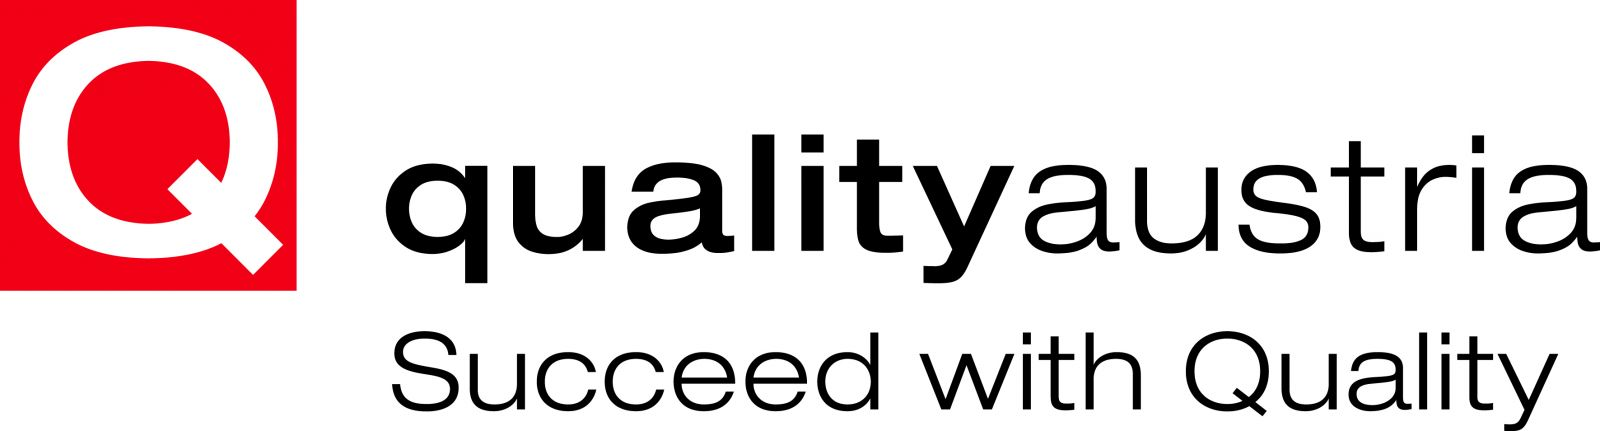 qualityaustria Logo en print